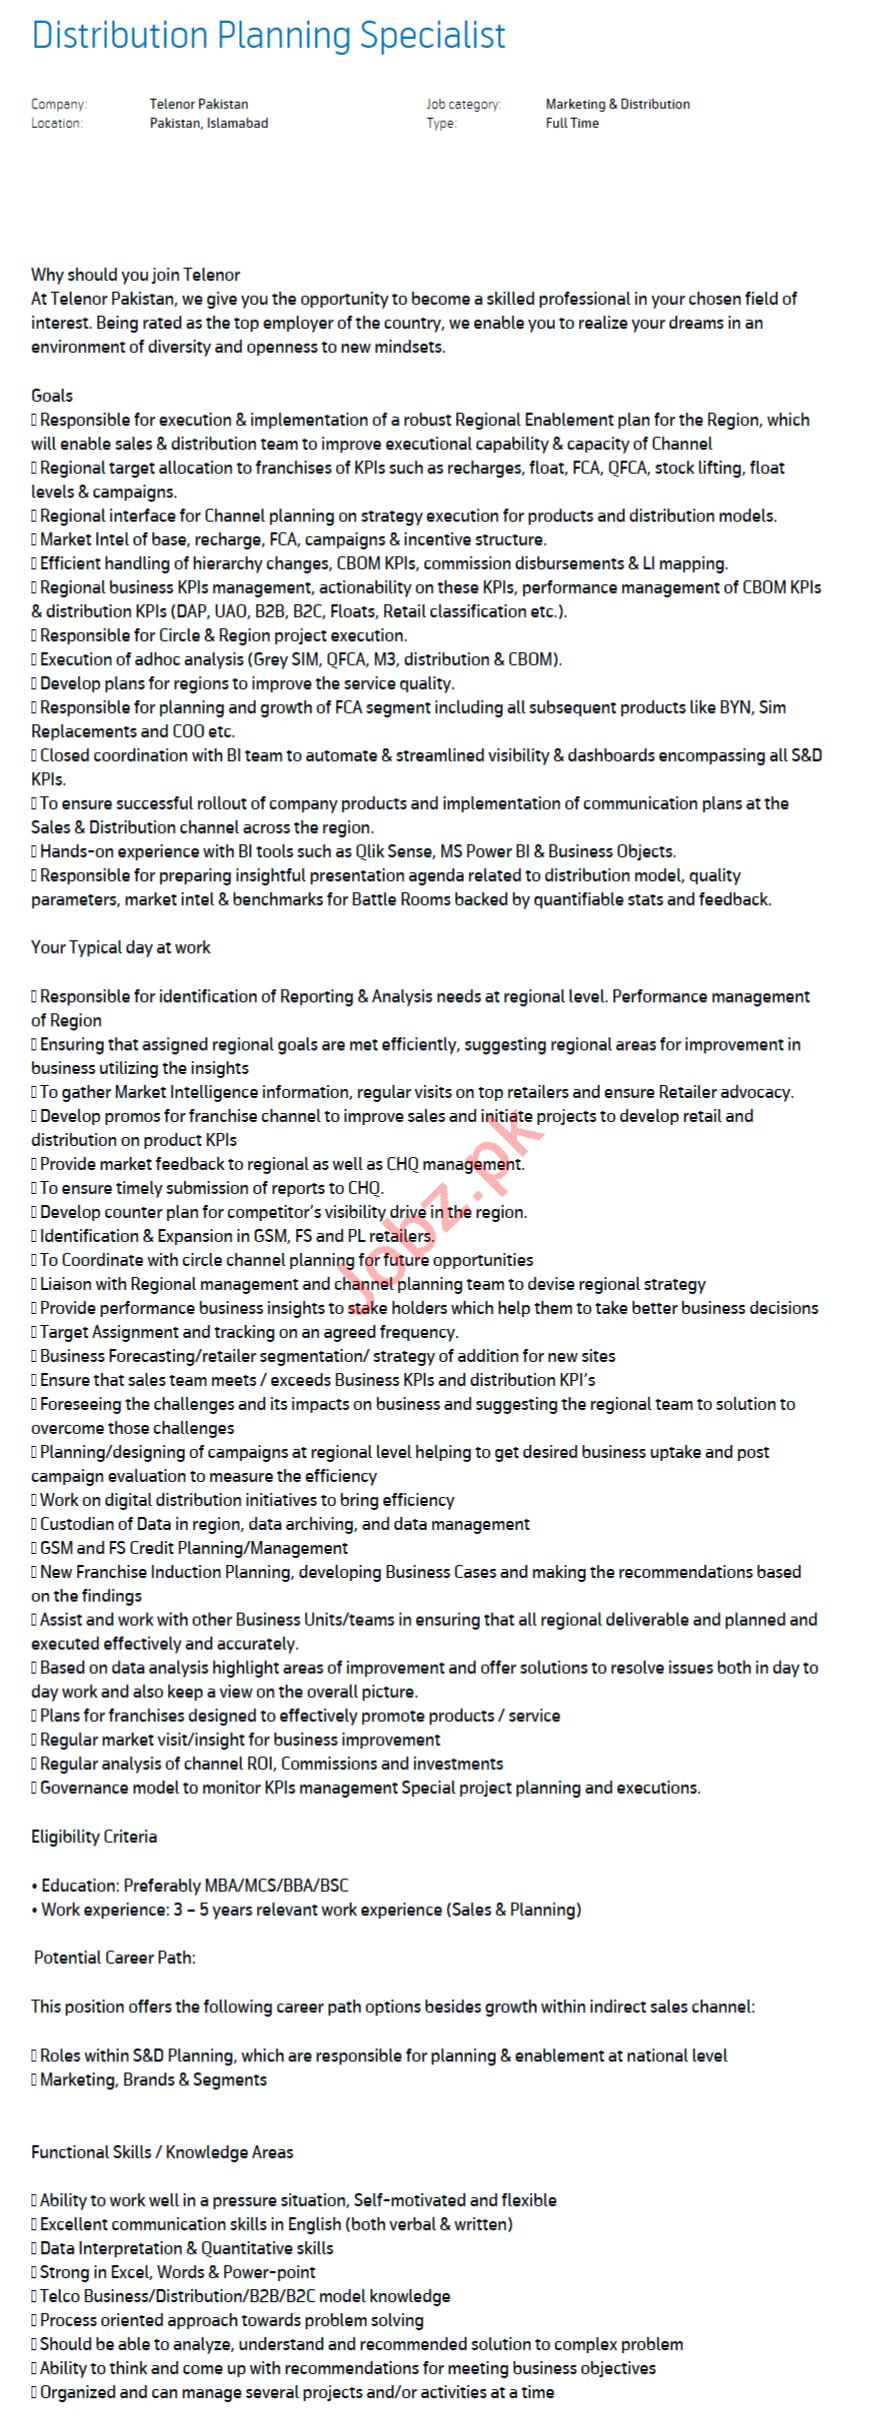 Telenor Pakistan Jobs 2020 Distribution Planning Specialist